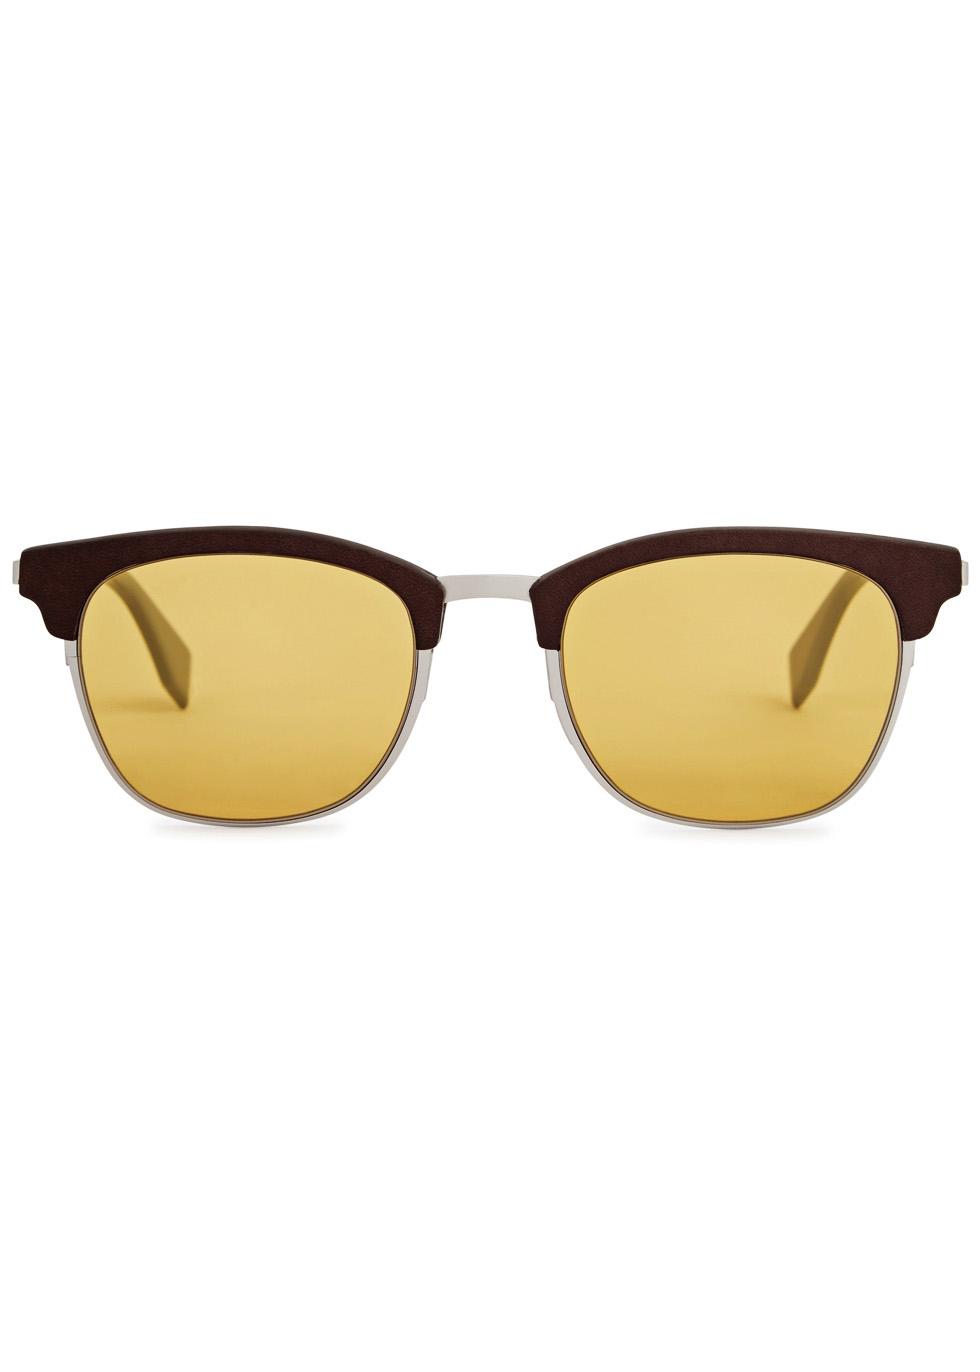 Brown clubmaster-style sunglasses - Fendi